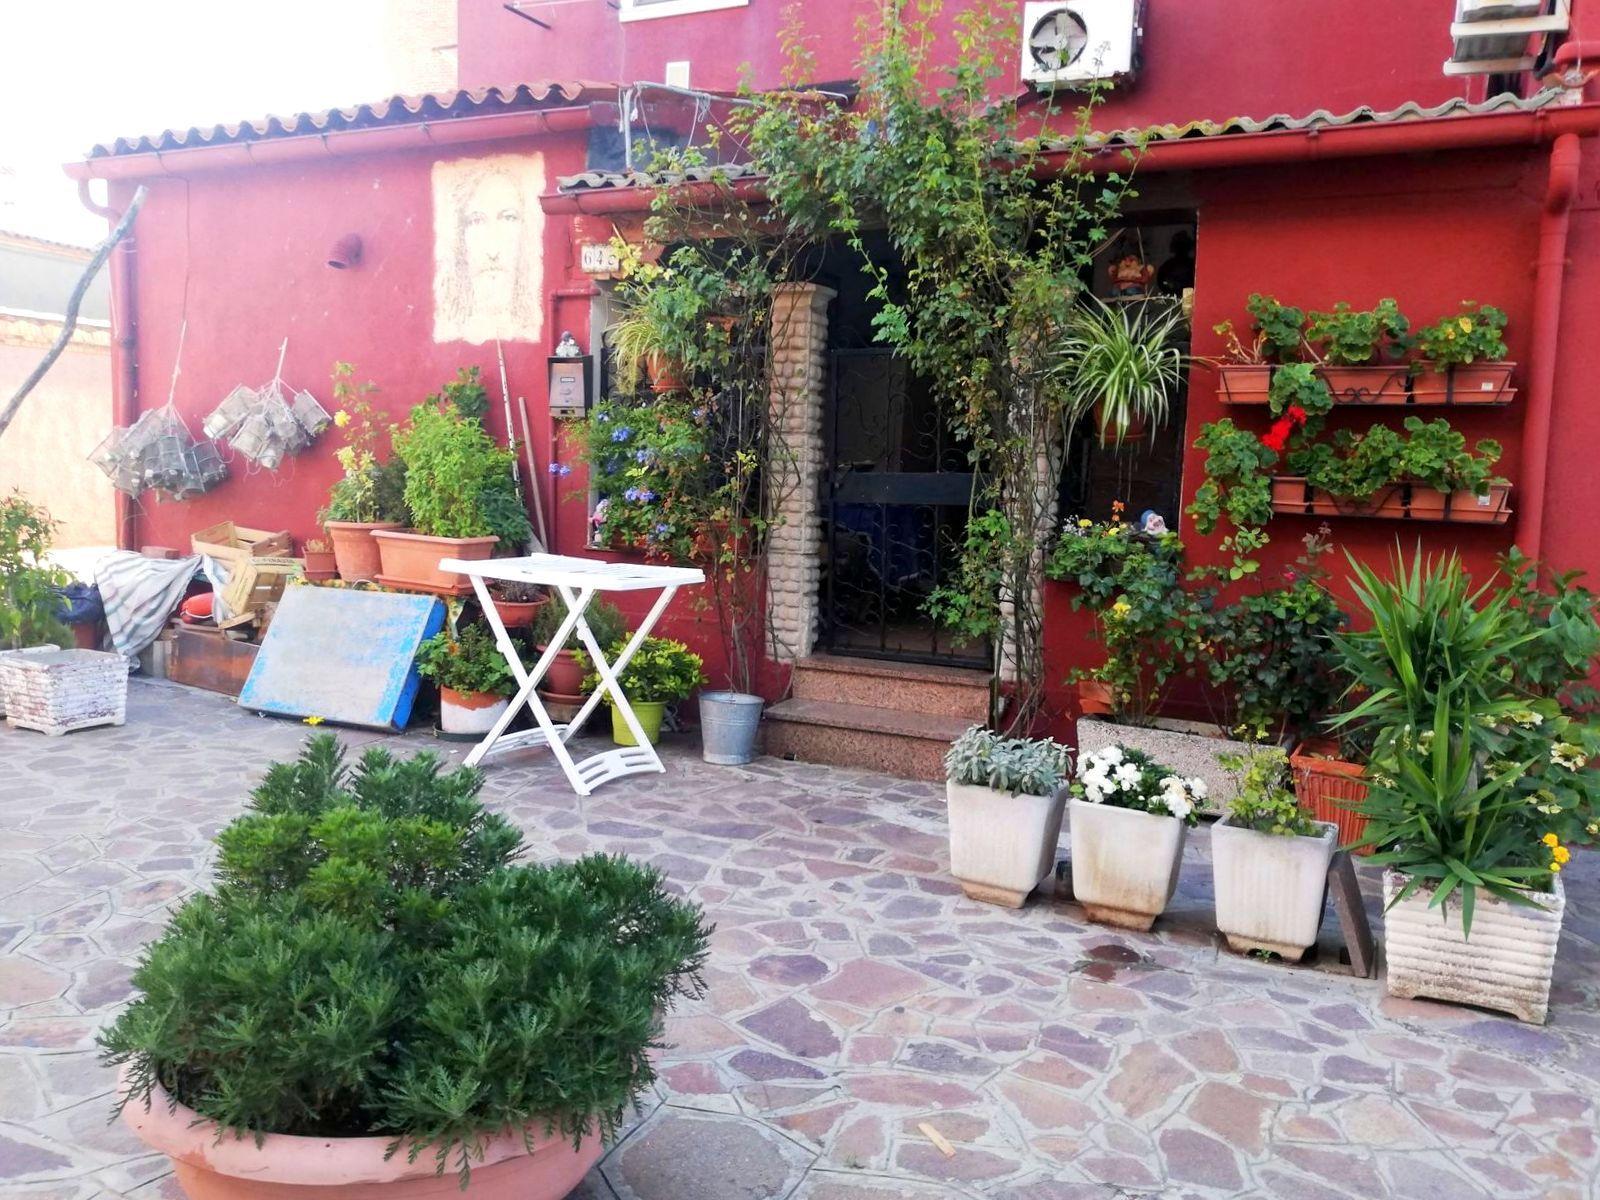 Visiter Burano et ses petits jardins